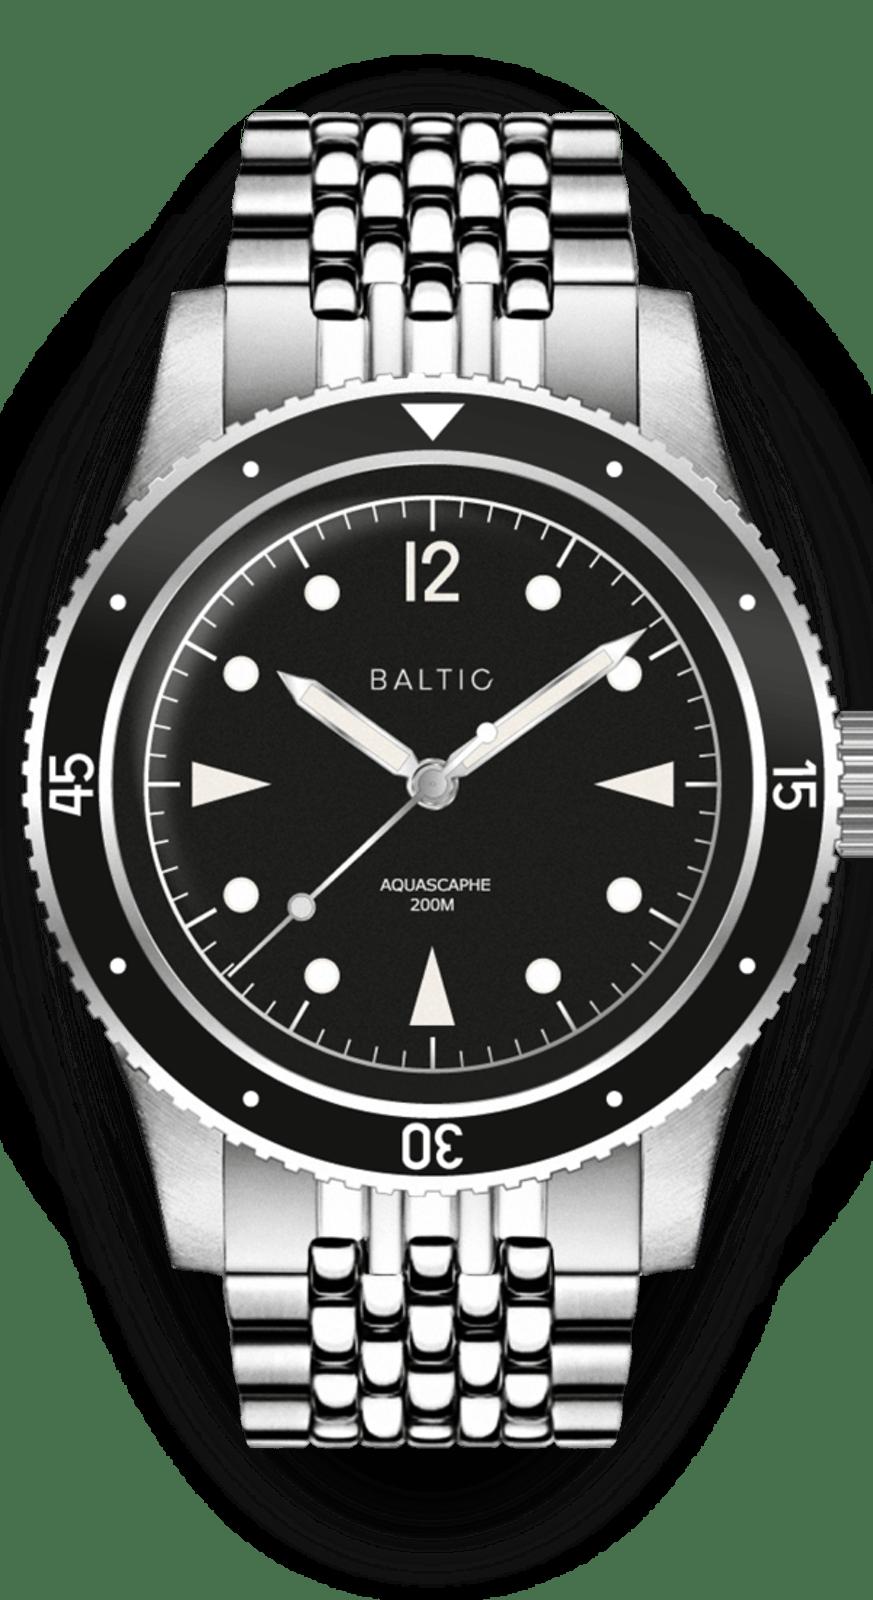 https---baltic.cdn.prismic.io-baltic-f178c5c8cfbedf54cd89c925d89be024adca8c2a_aqua-packshot-1.png